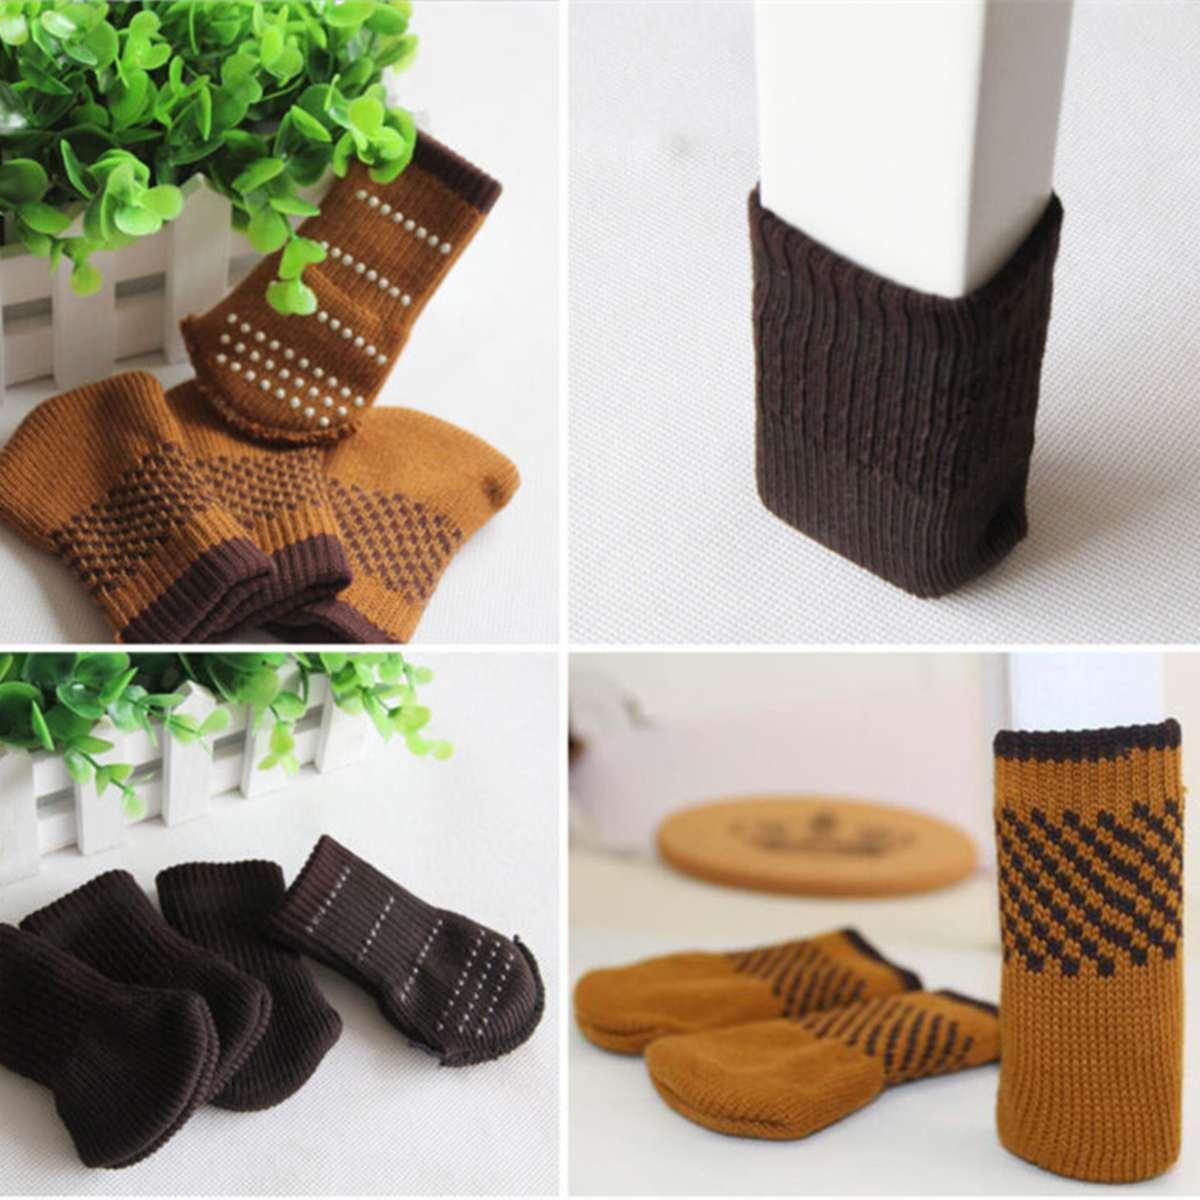 Table Furniture Feet Sleeve Cover Protectors 24Pcs Chair Leg Socks Cloth Gloves Floor Protection Knitting Wool Socks Anti-slip